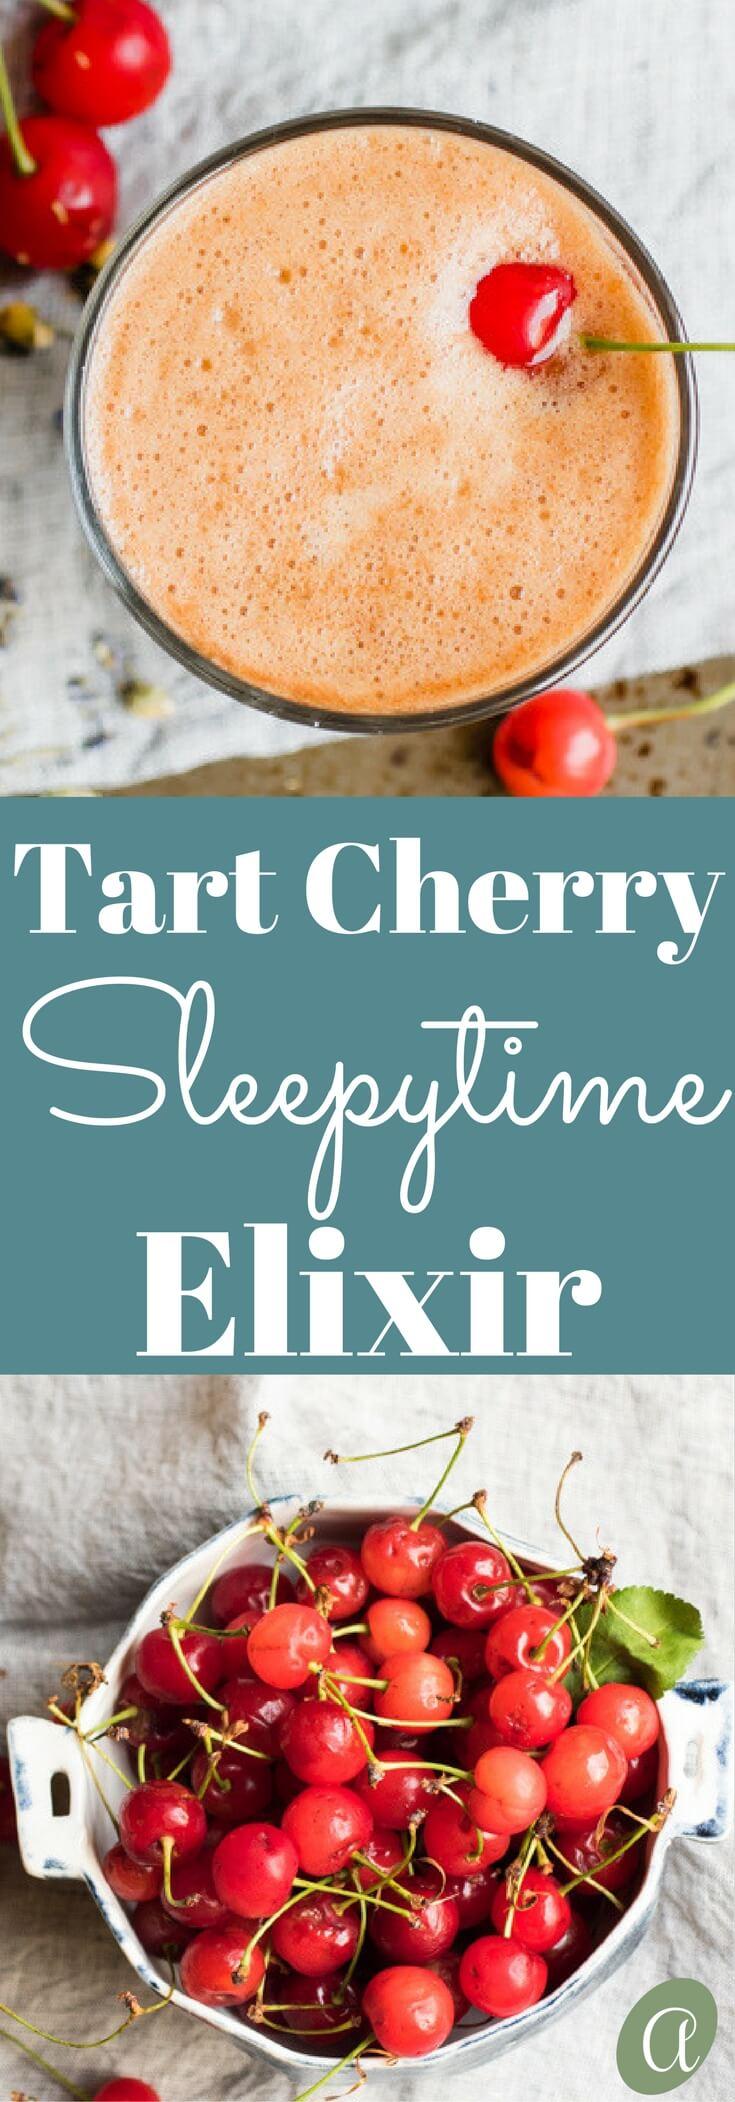 A warm sleepytime elixir with chamomile, lavender, and tart cherry to encourage deep restful sleep.